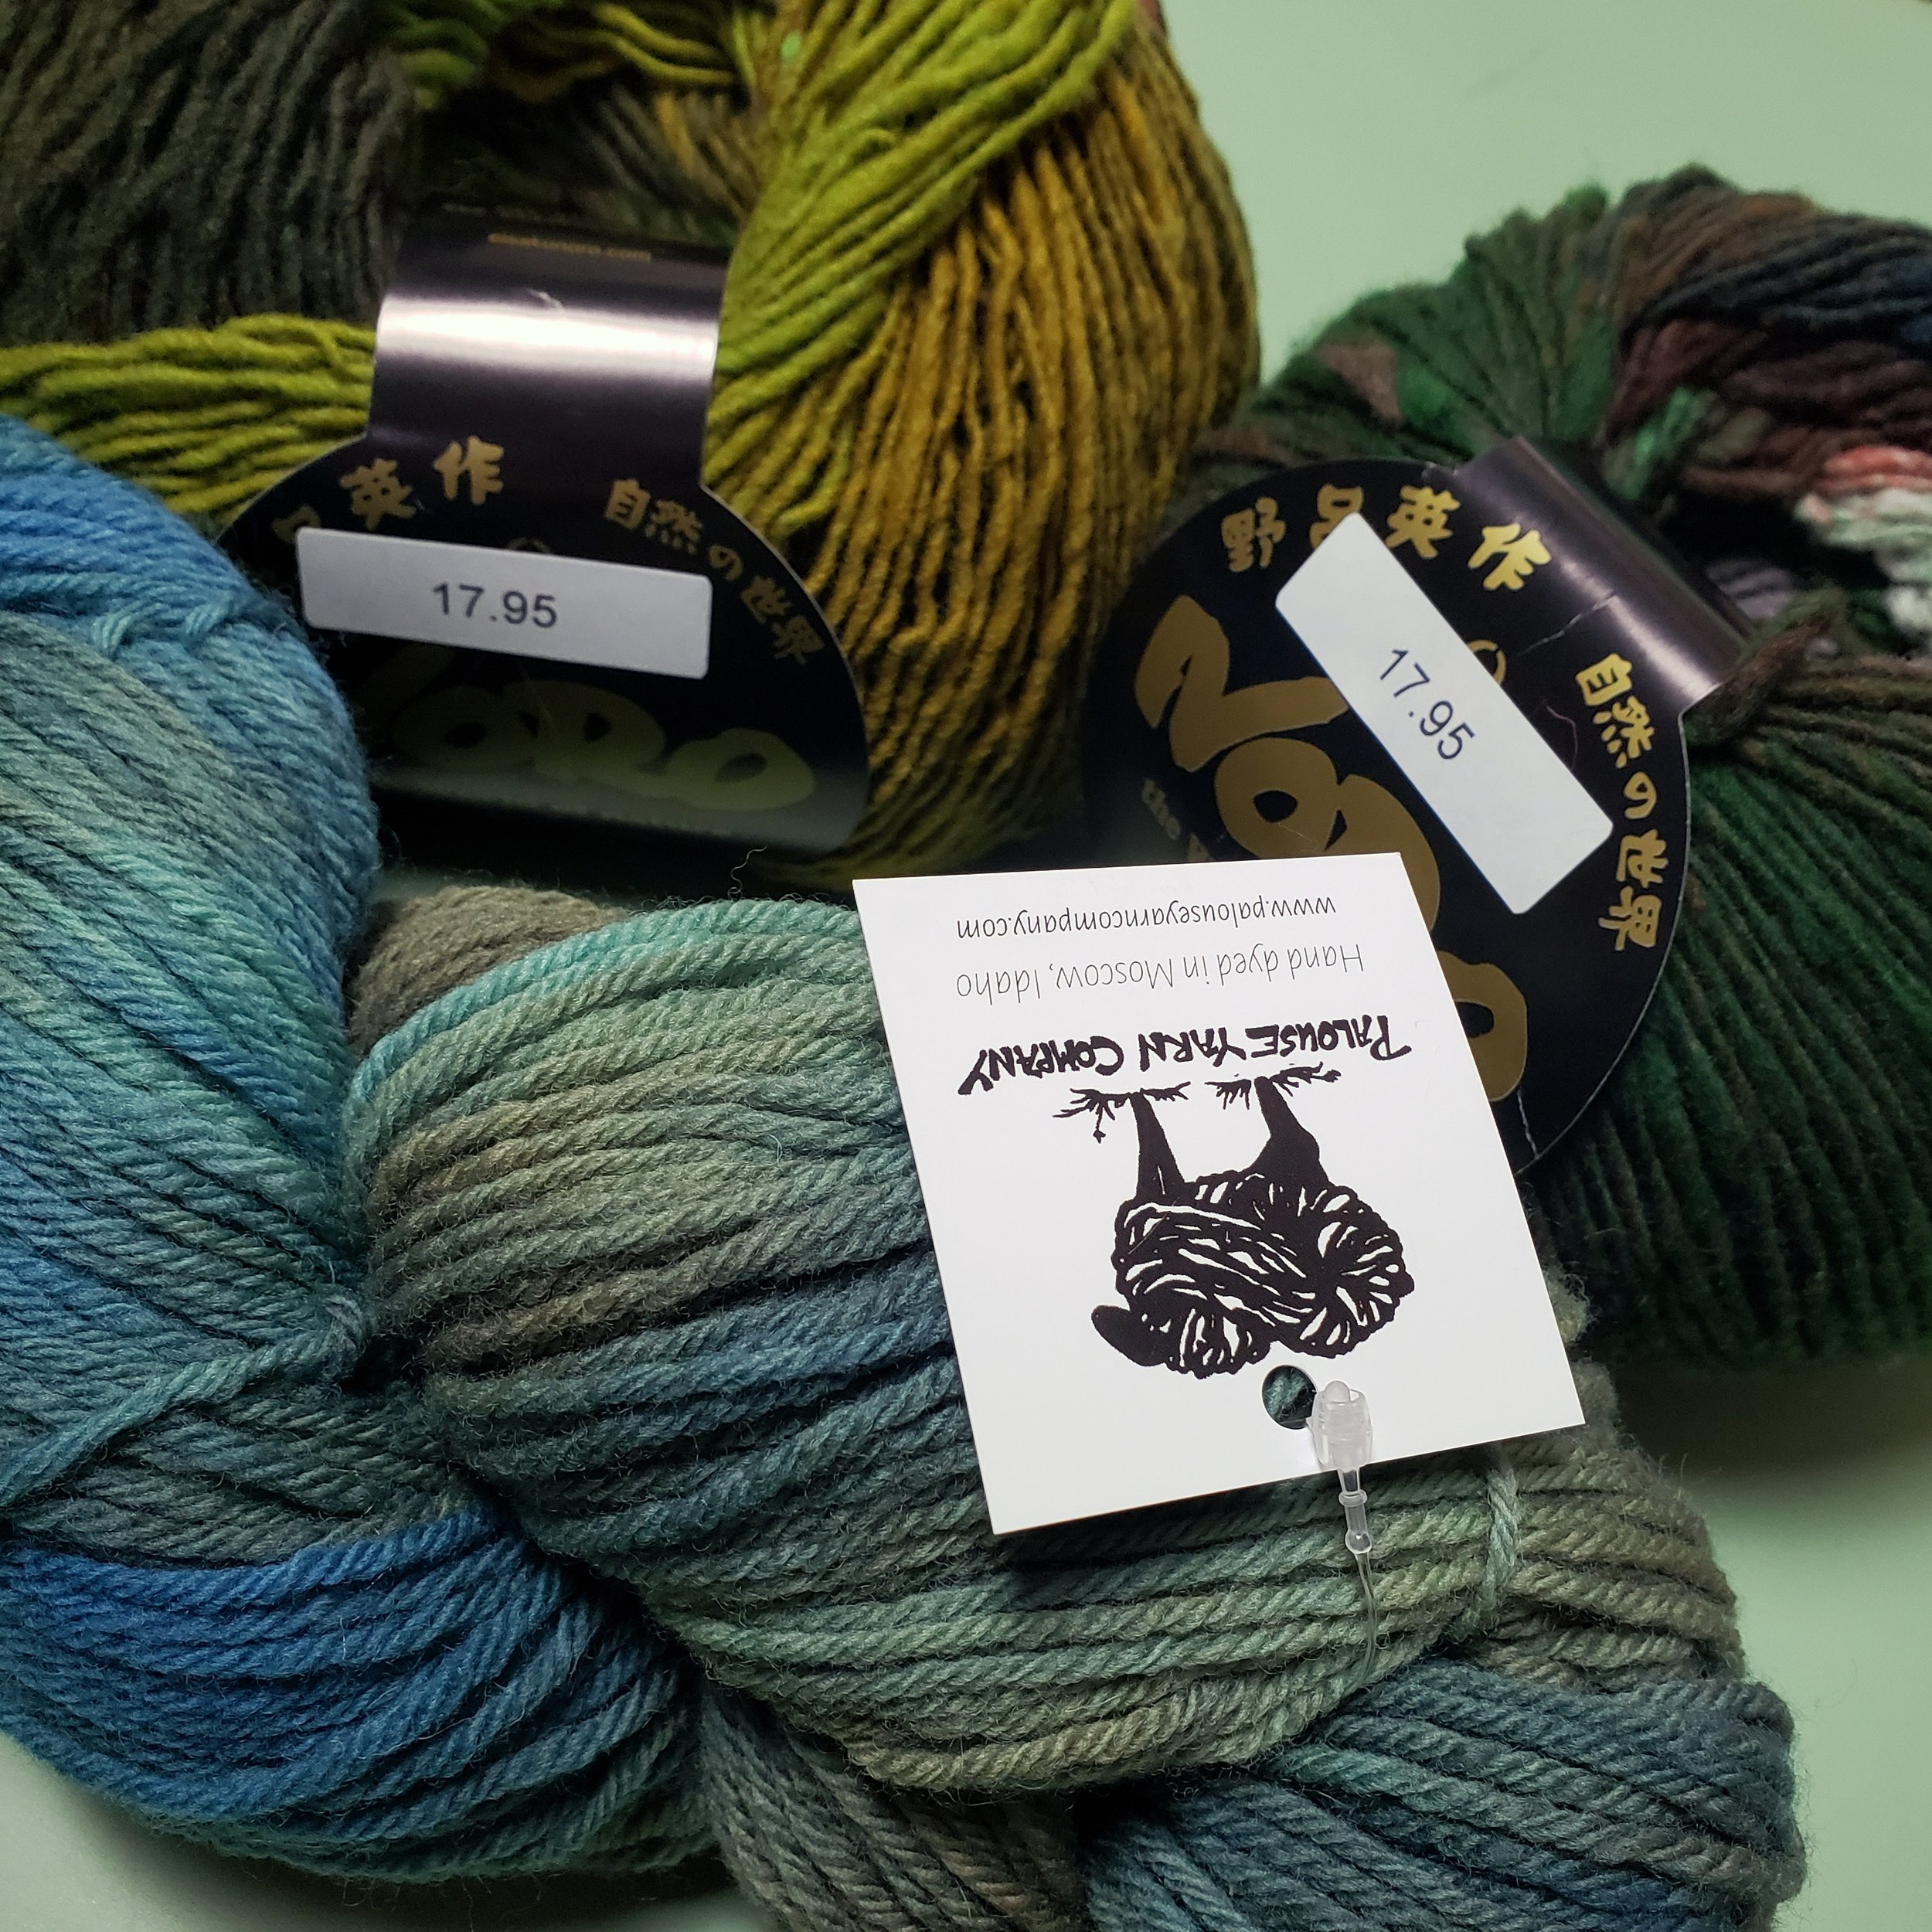 New yarn from Palouse Yarn Company and Noro.